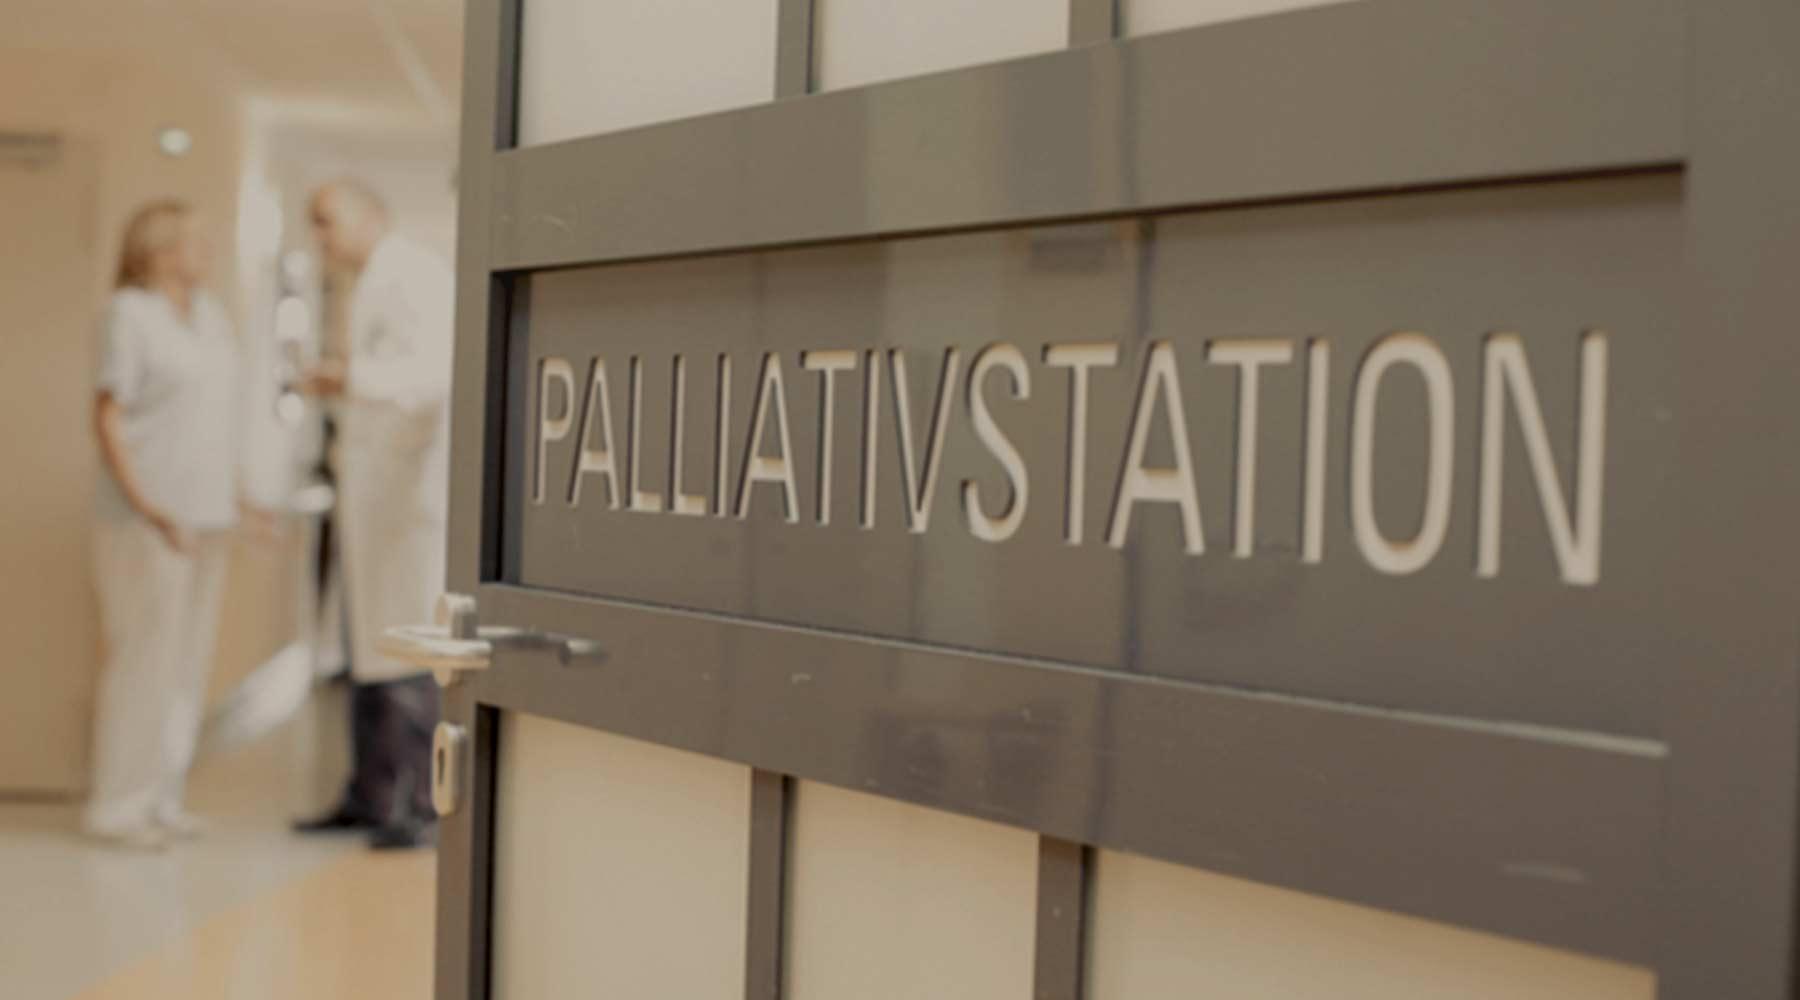 PALLIATIVSTATION EBERSBERG